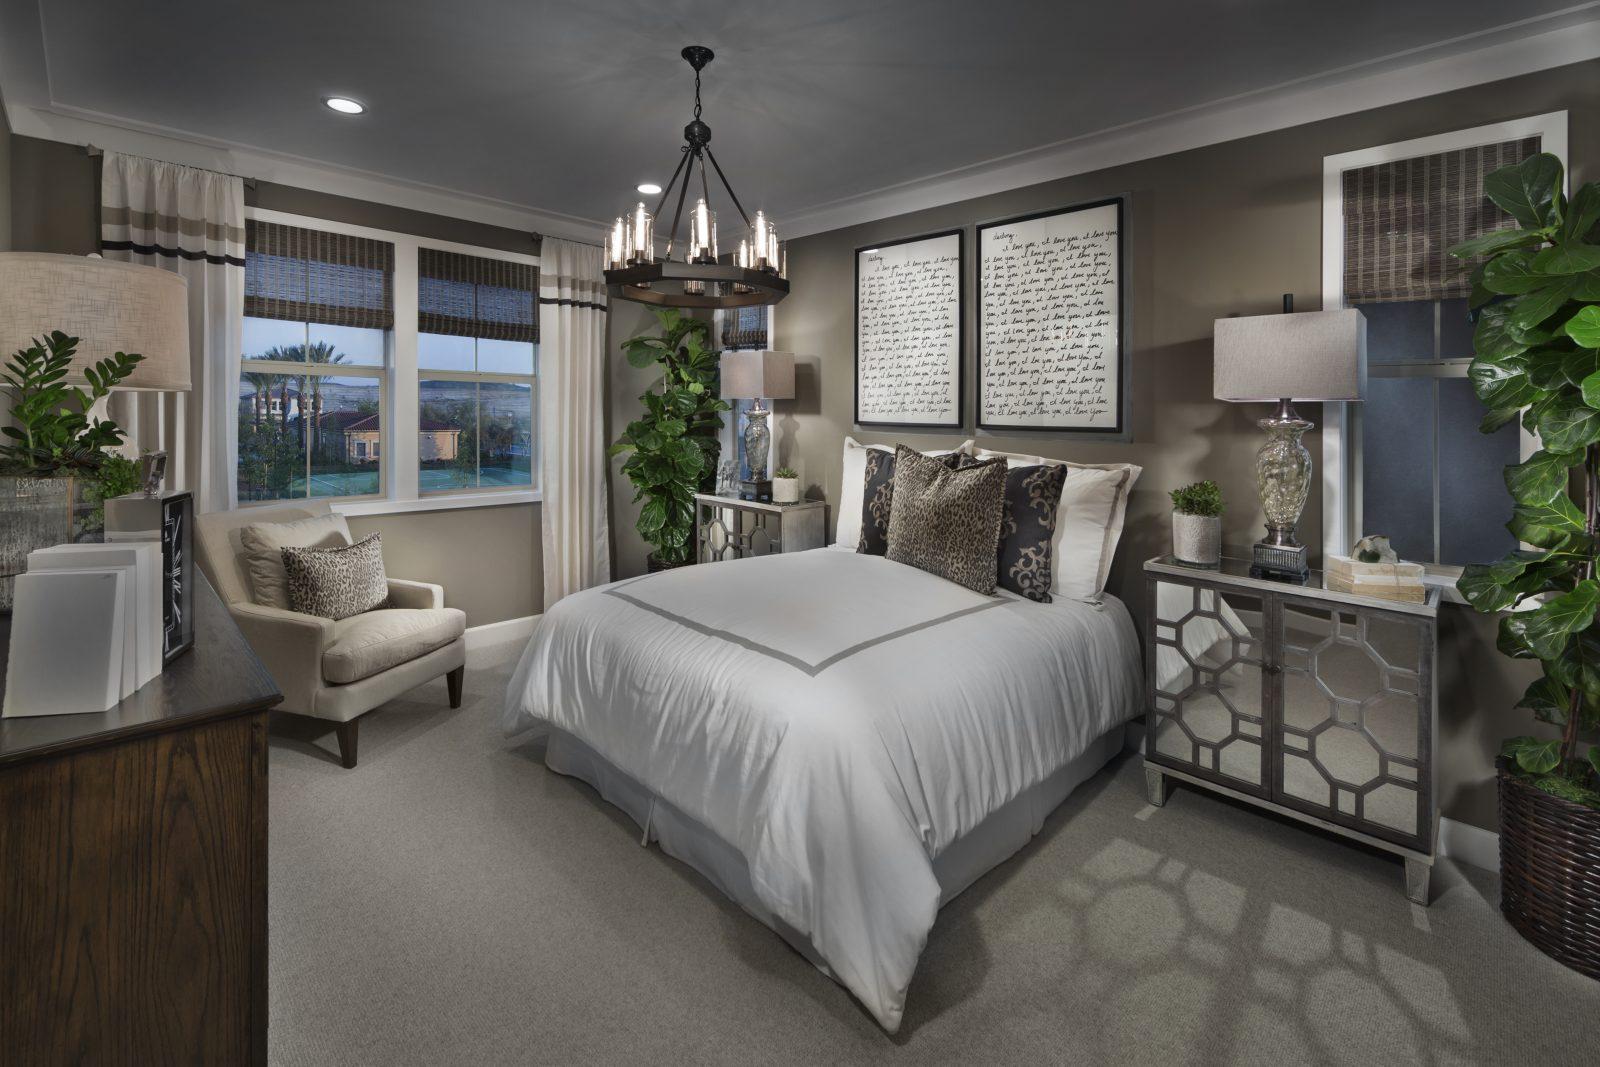 irvine bedroom legado california residence springs portola county orange homes master southern count la totalallowedchildren